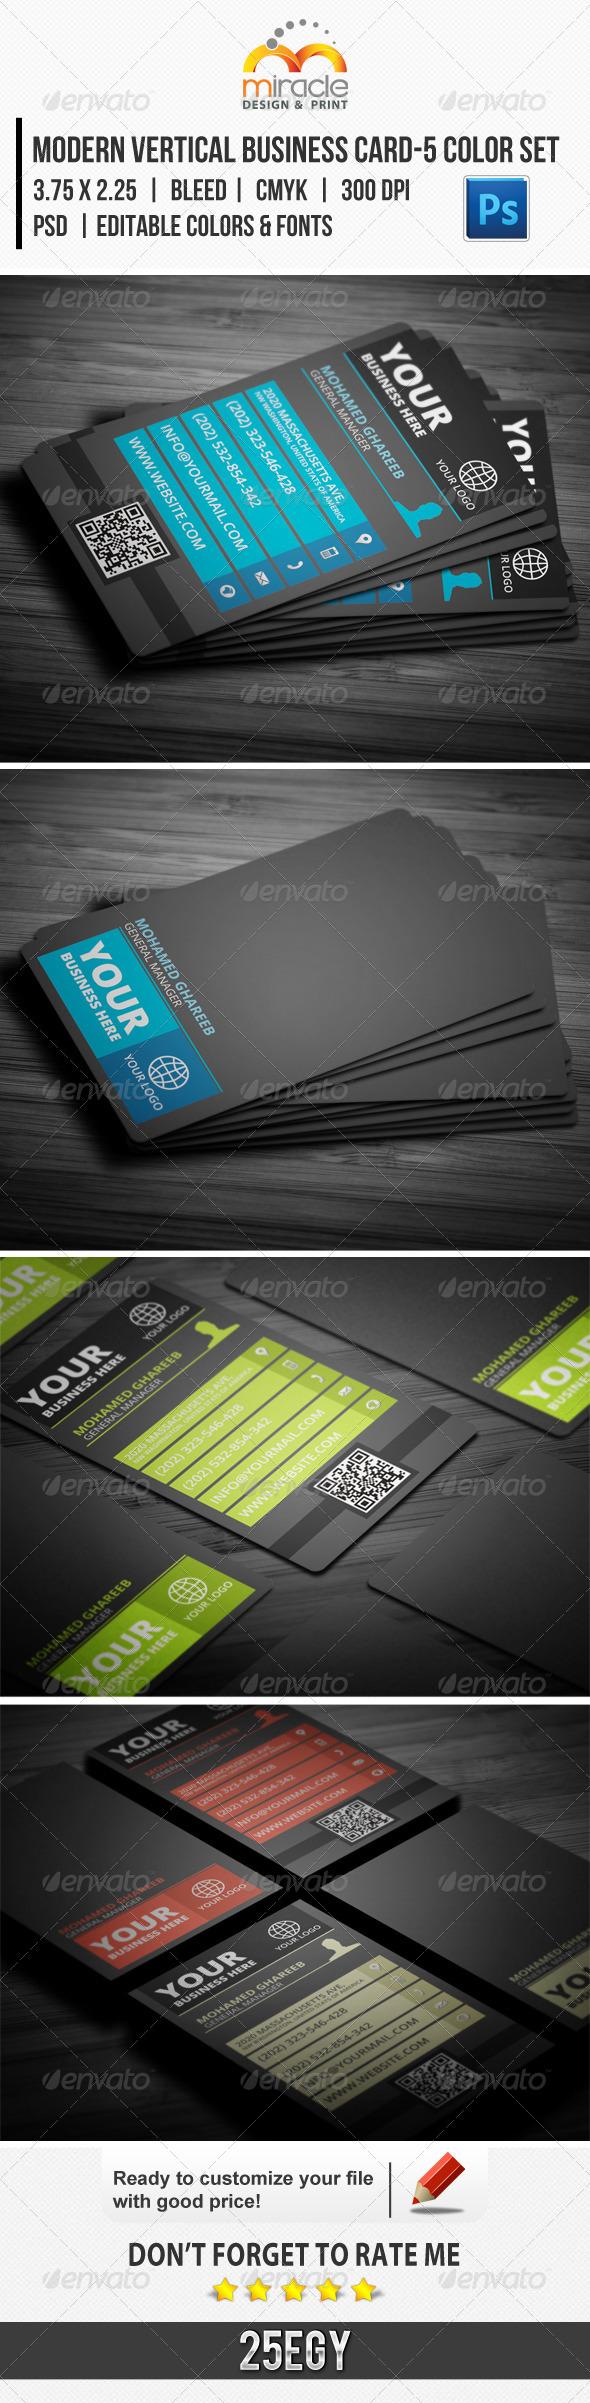 Modern Vertical Business Card-5 Color Set - Creative Business Cards